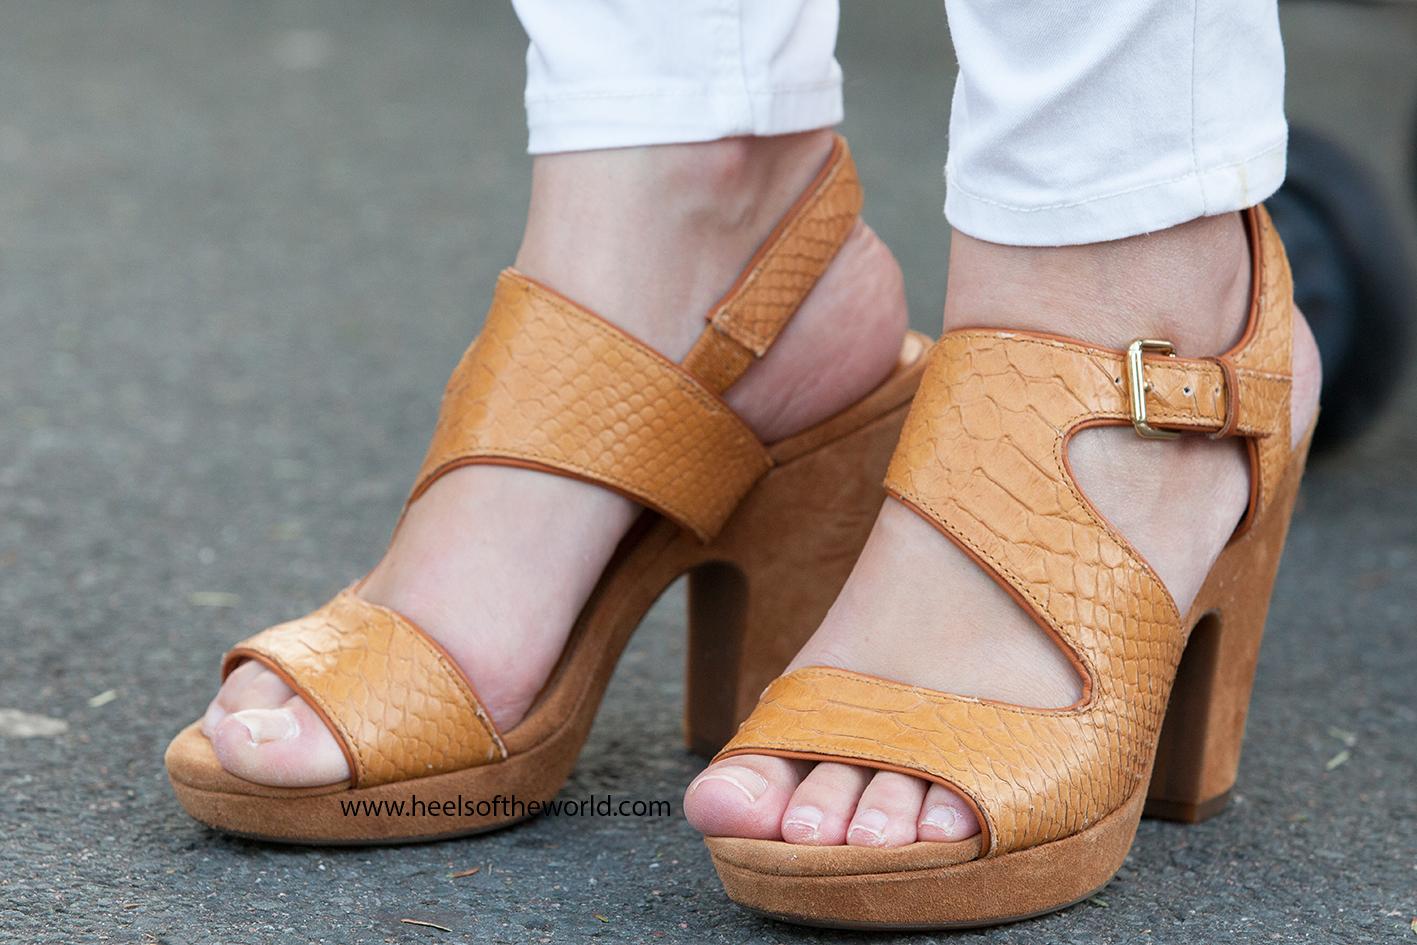 Dutch heels. Photography at Straattheater Lansingerland in Bergschenhoek. Brand: Geox